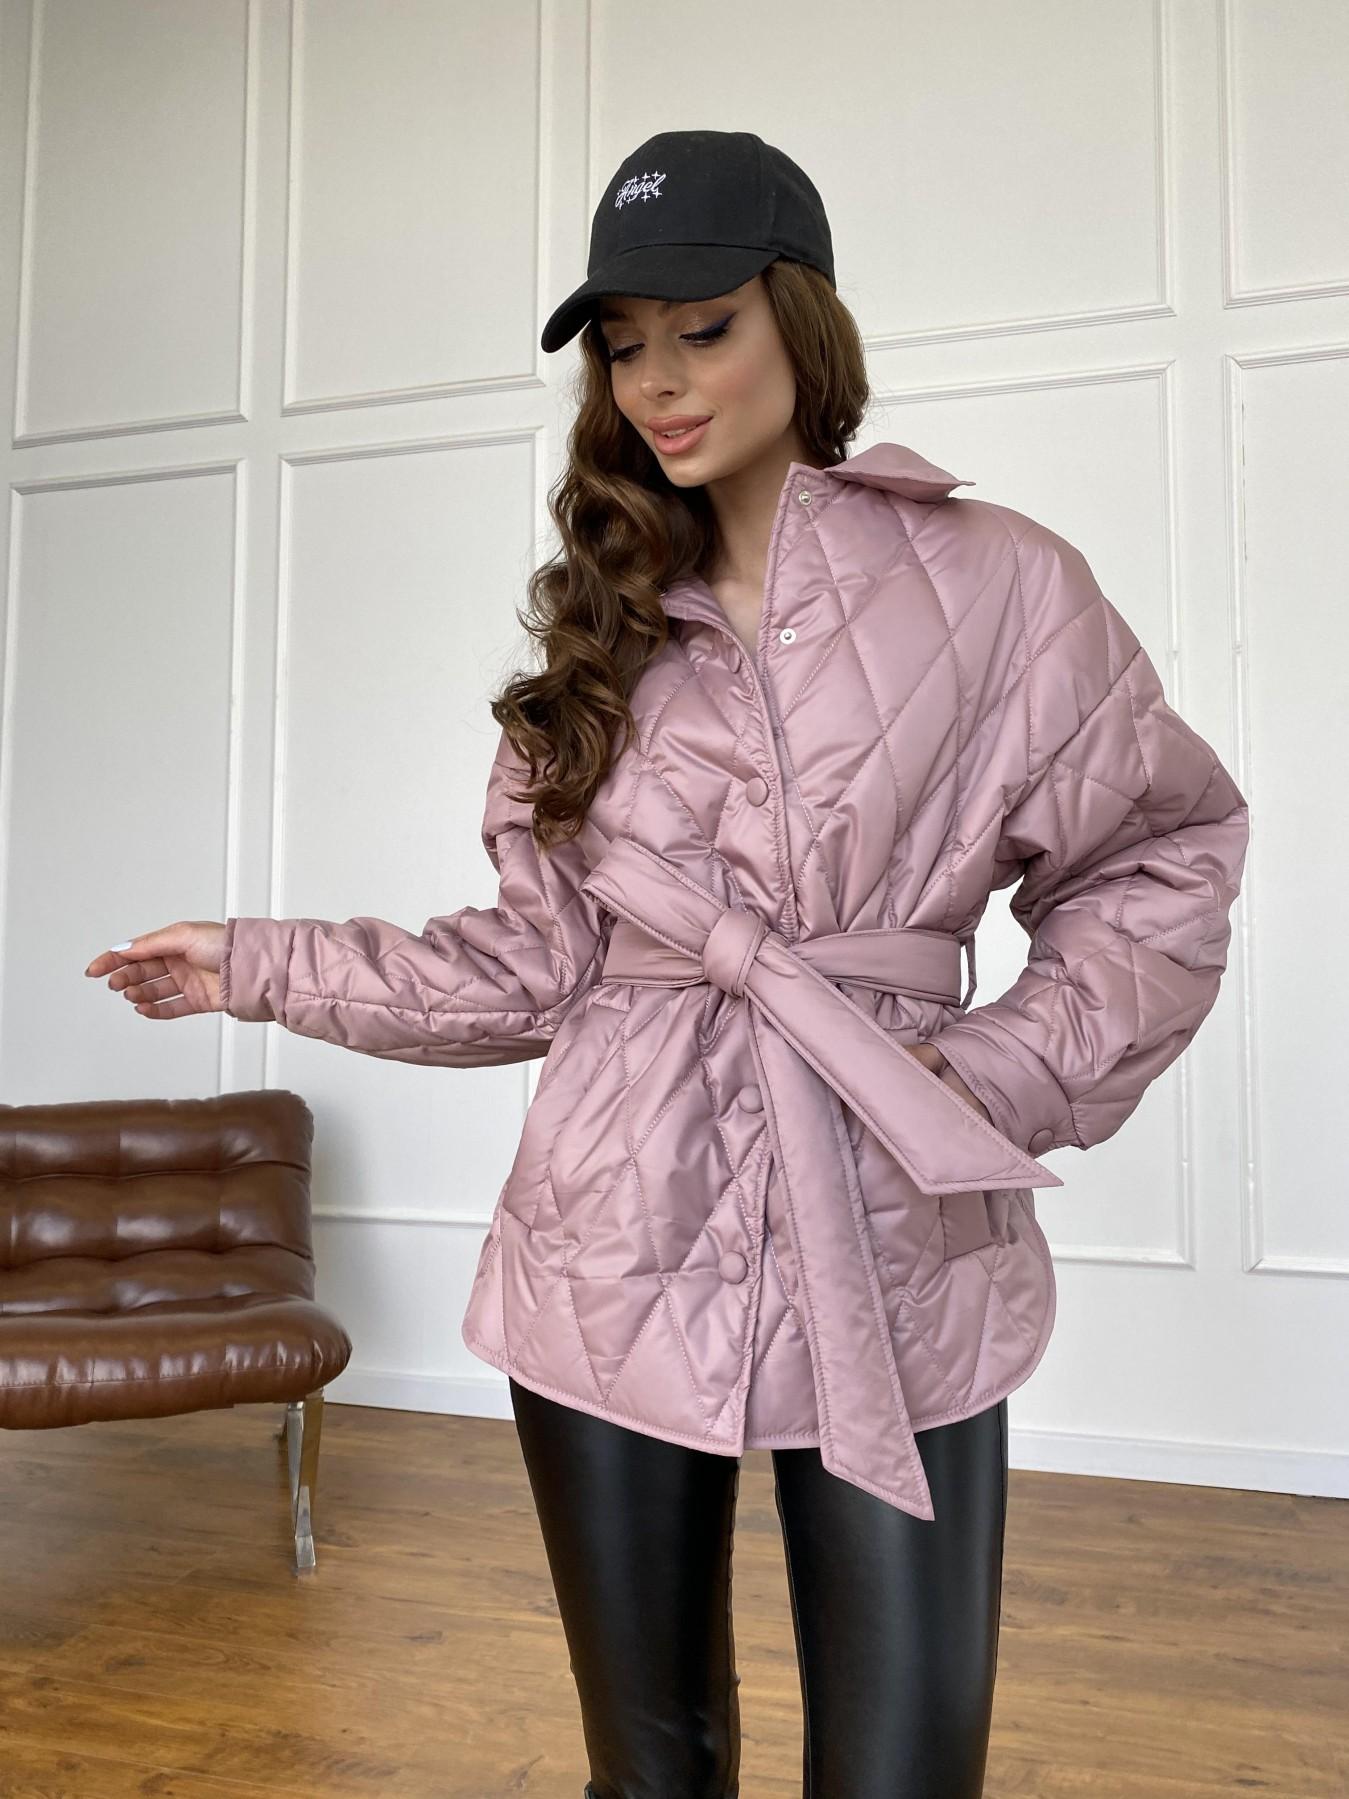 Моно  куртка из плащевой ткани Gloria 11081 АРТ. 47647 Цвет: Пудра - фото 11, интернет магазин tm-modus.ru